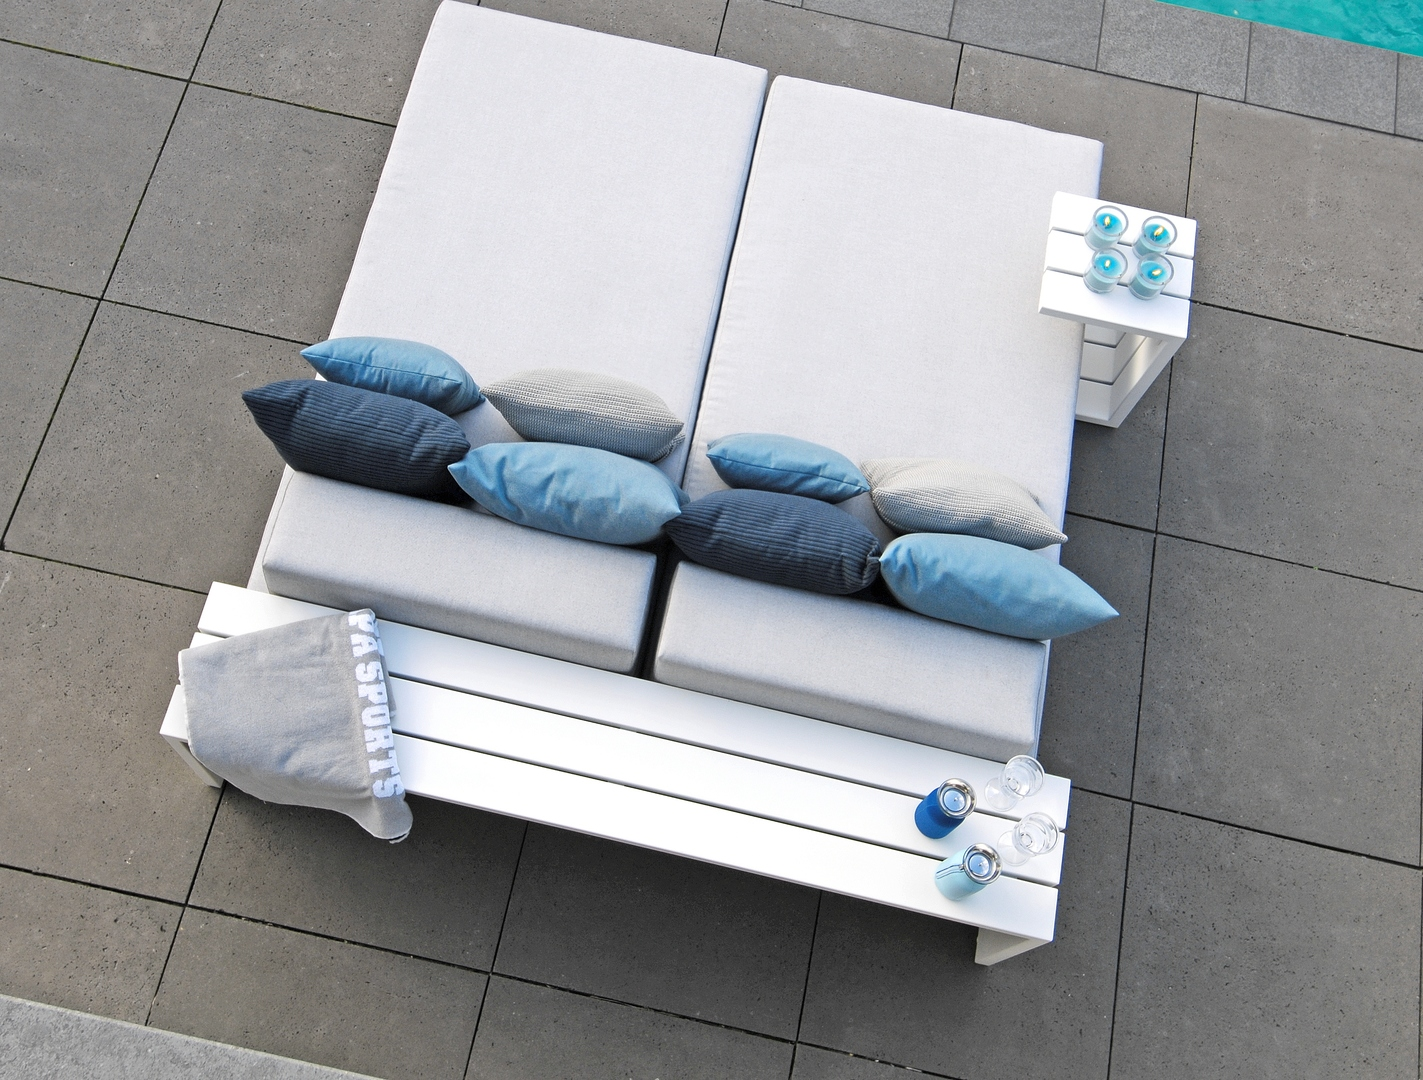 Borek aluminium Samos day-dream side table and coffee table-1 (1).jpg